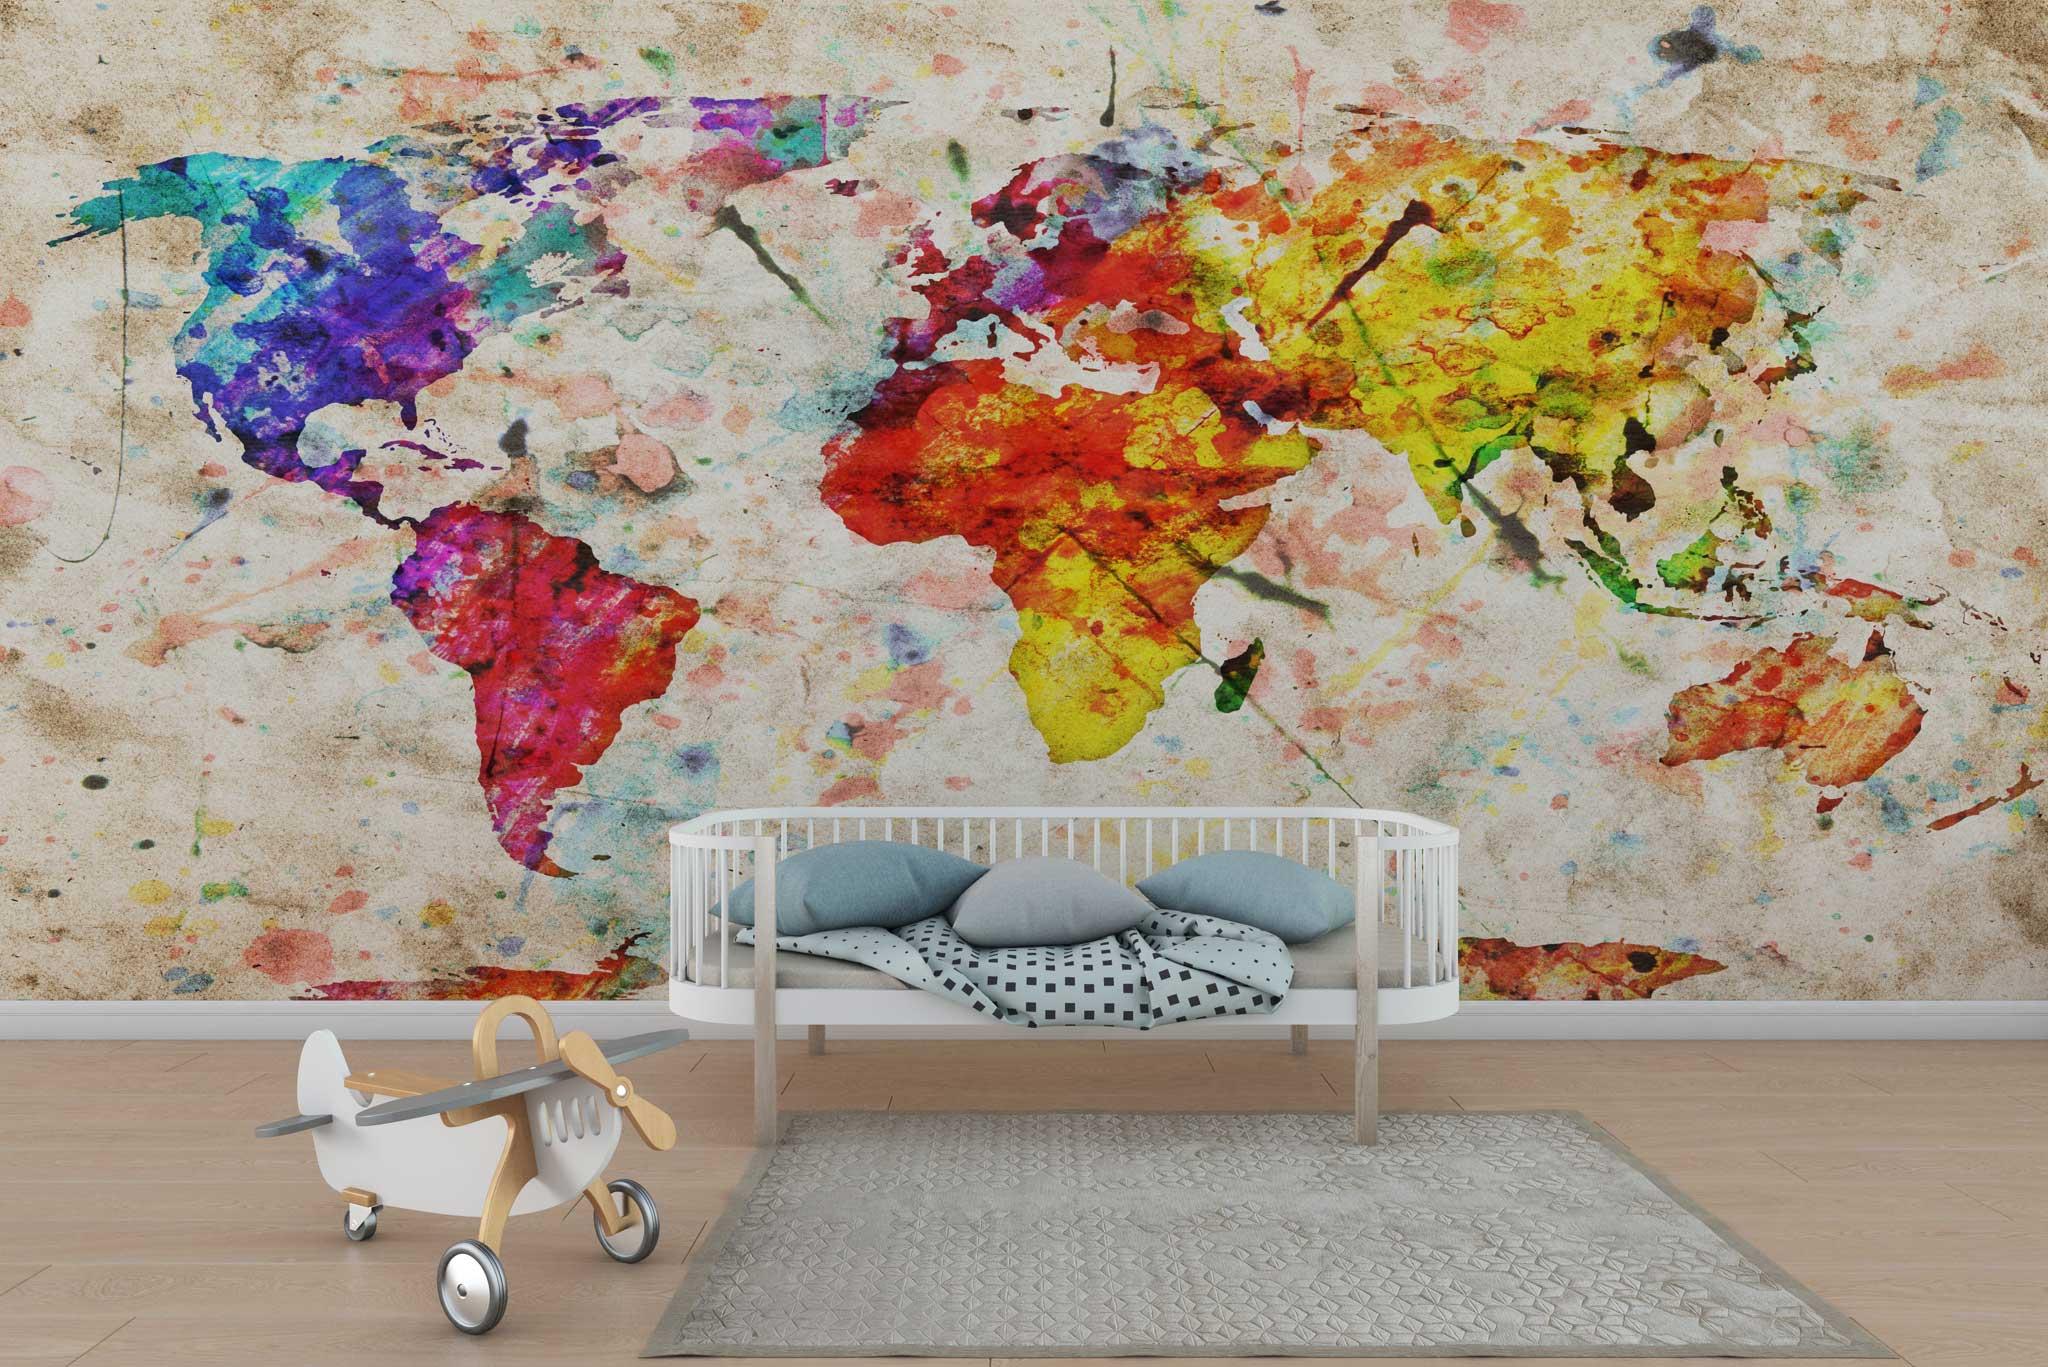 tapet-fototapet-design-personalizat-customizabil-comanda-special-camera-dormitor-copii-model-desen-pictata-harta-lumii-multicolor